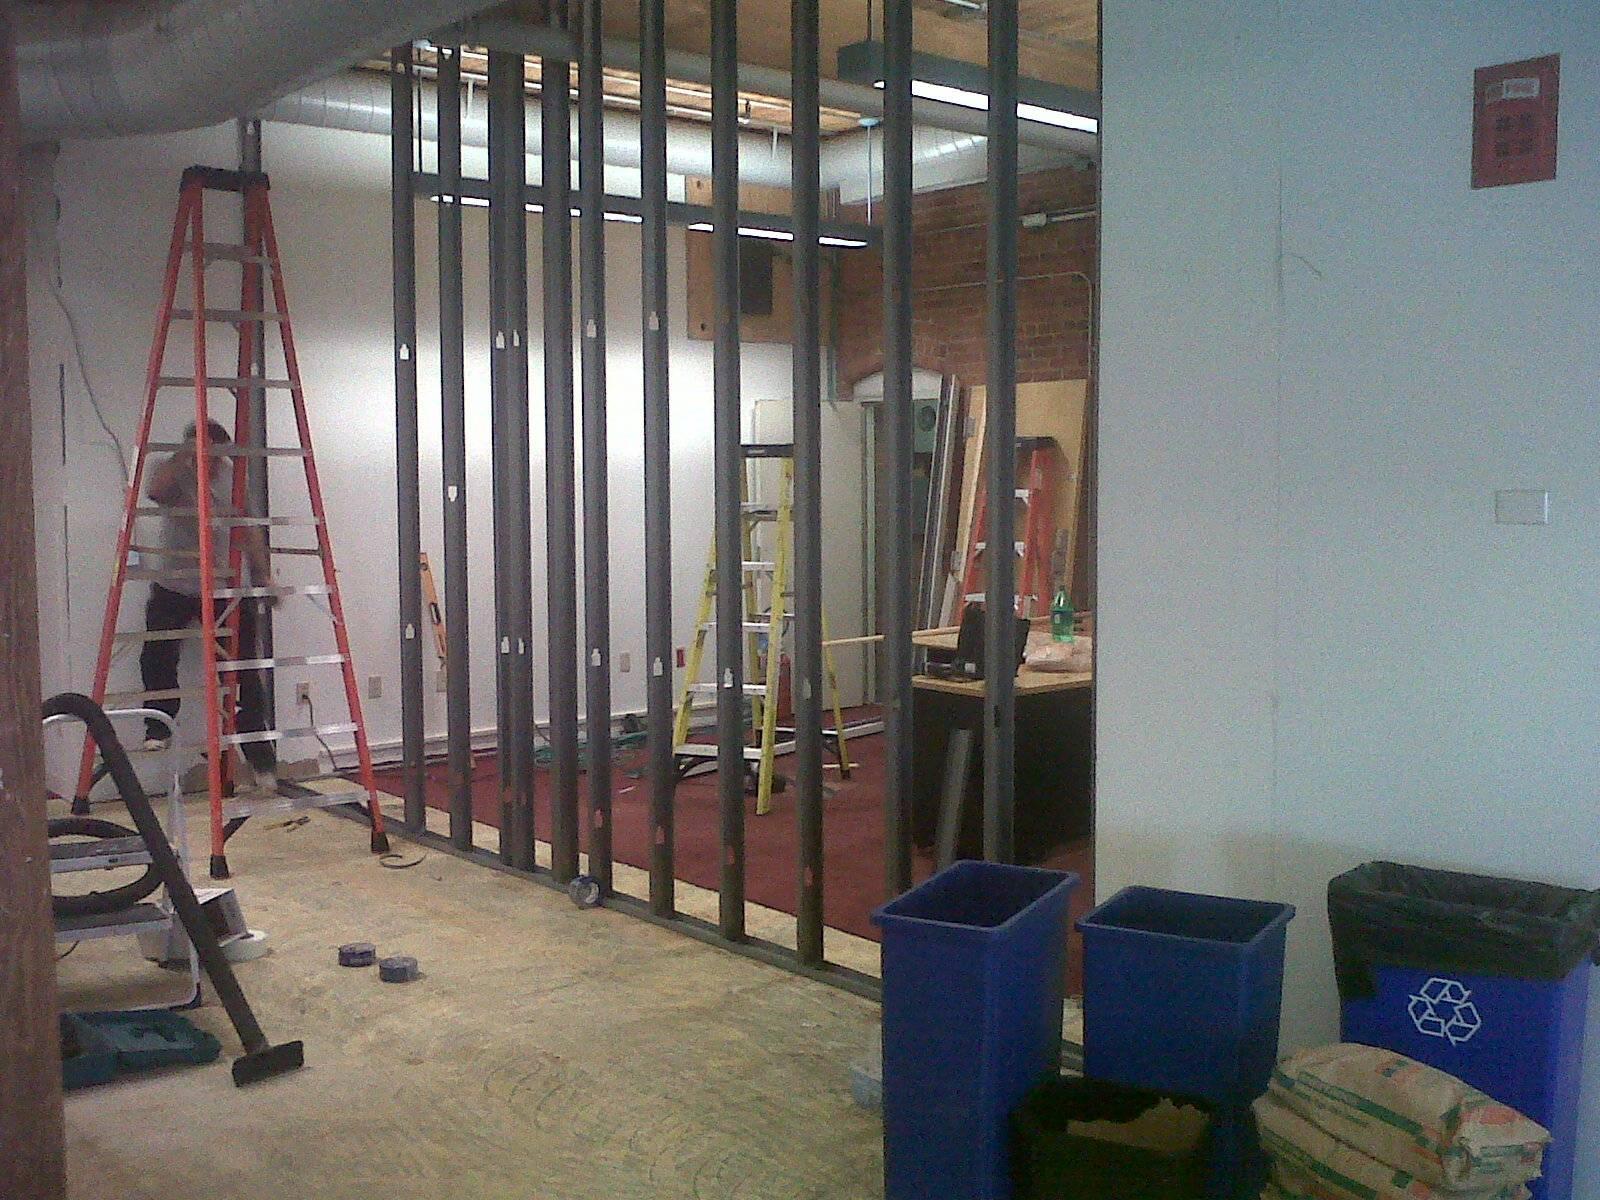 Progress Image 2: Metal Framing Going Up For New Storage Room